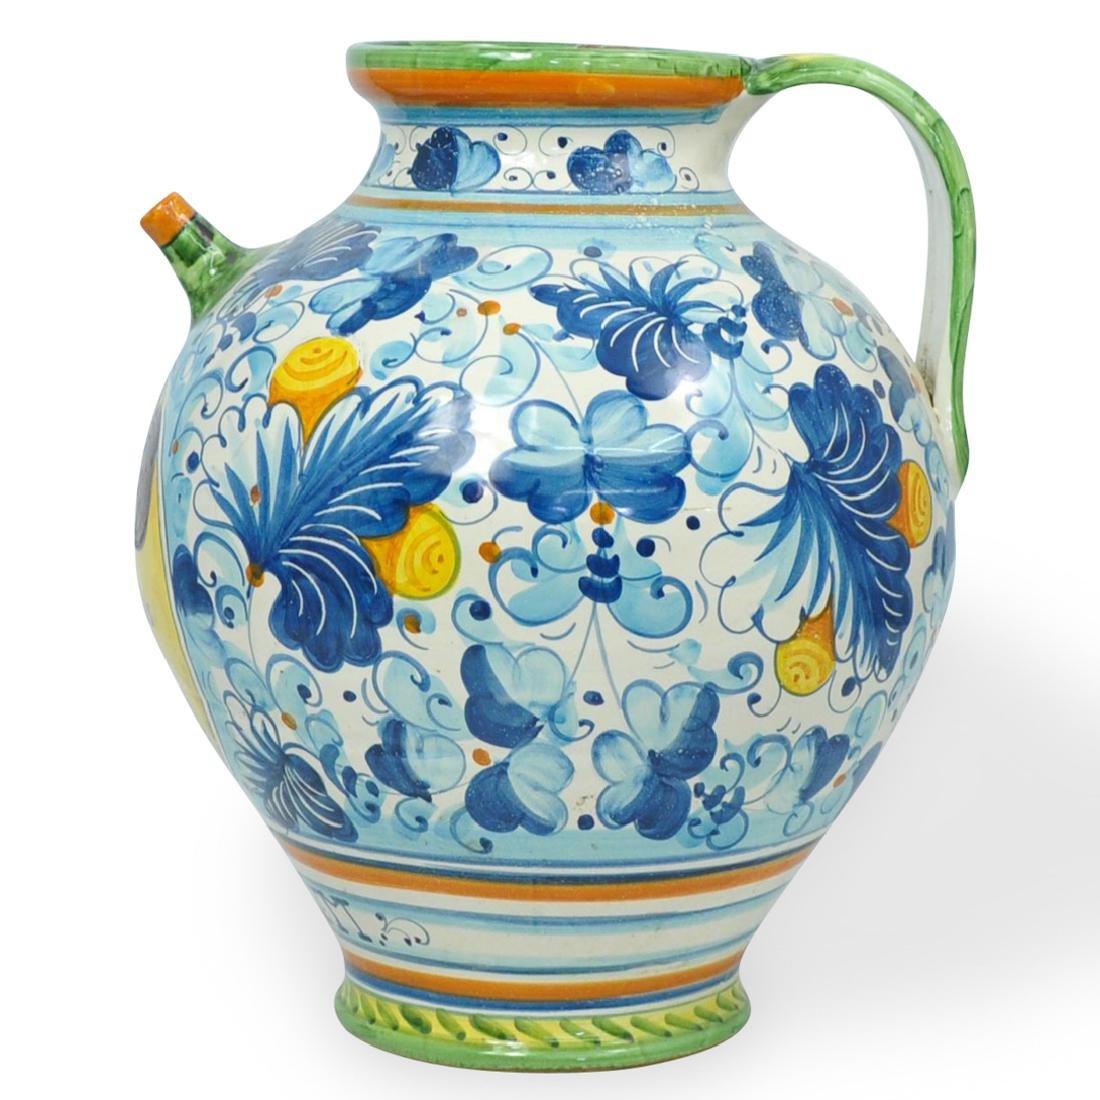 Italian Majolica Pottery Pitcher